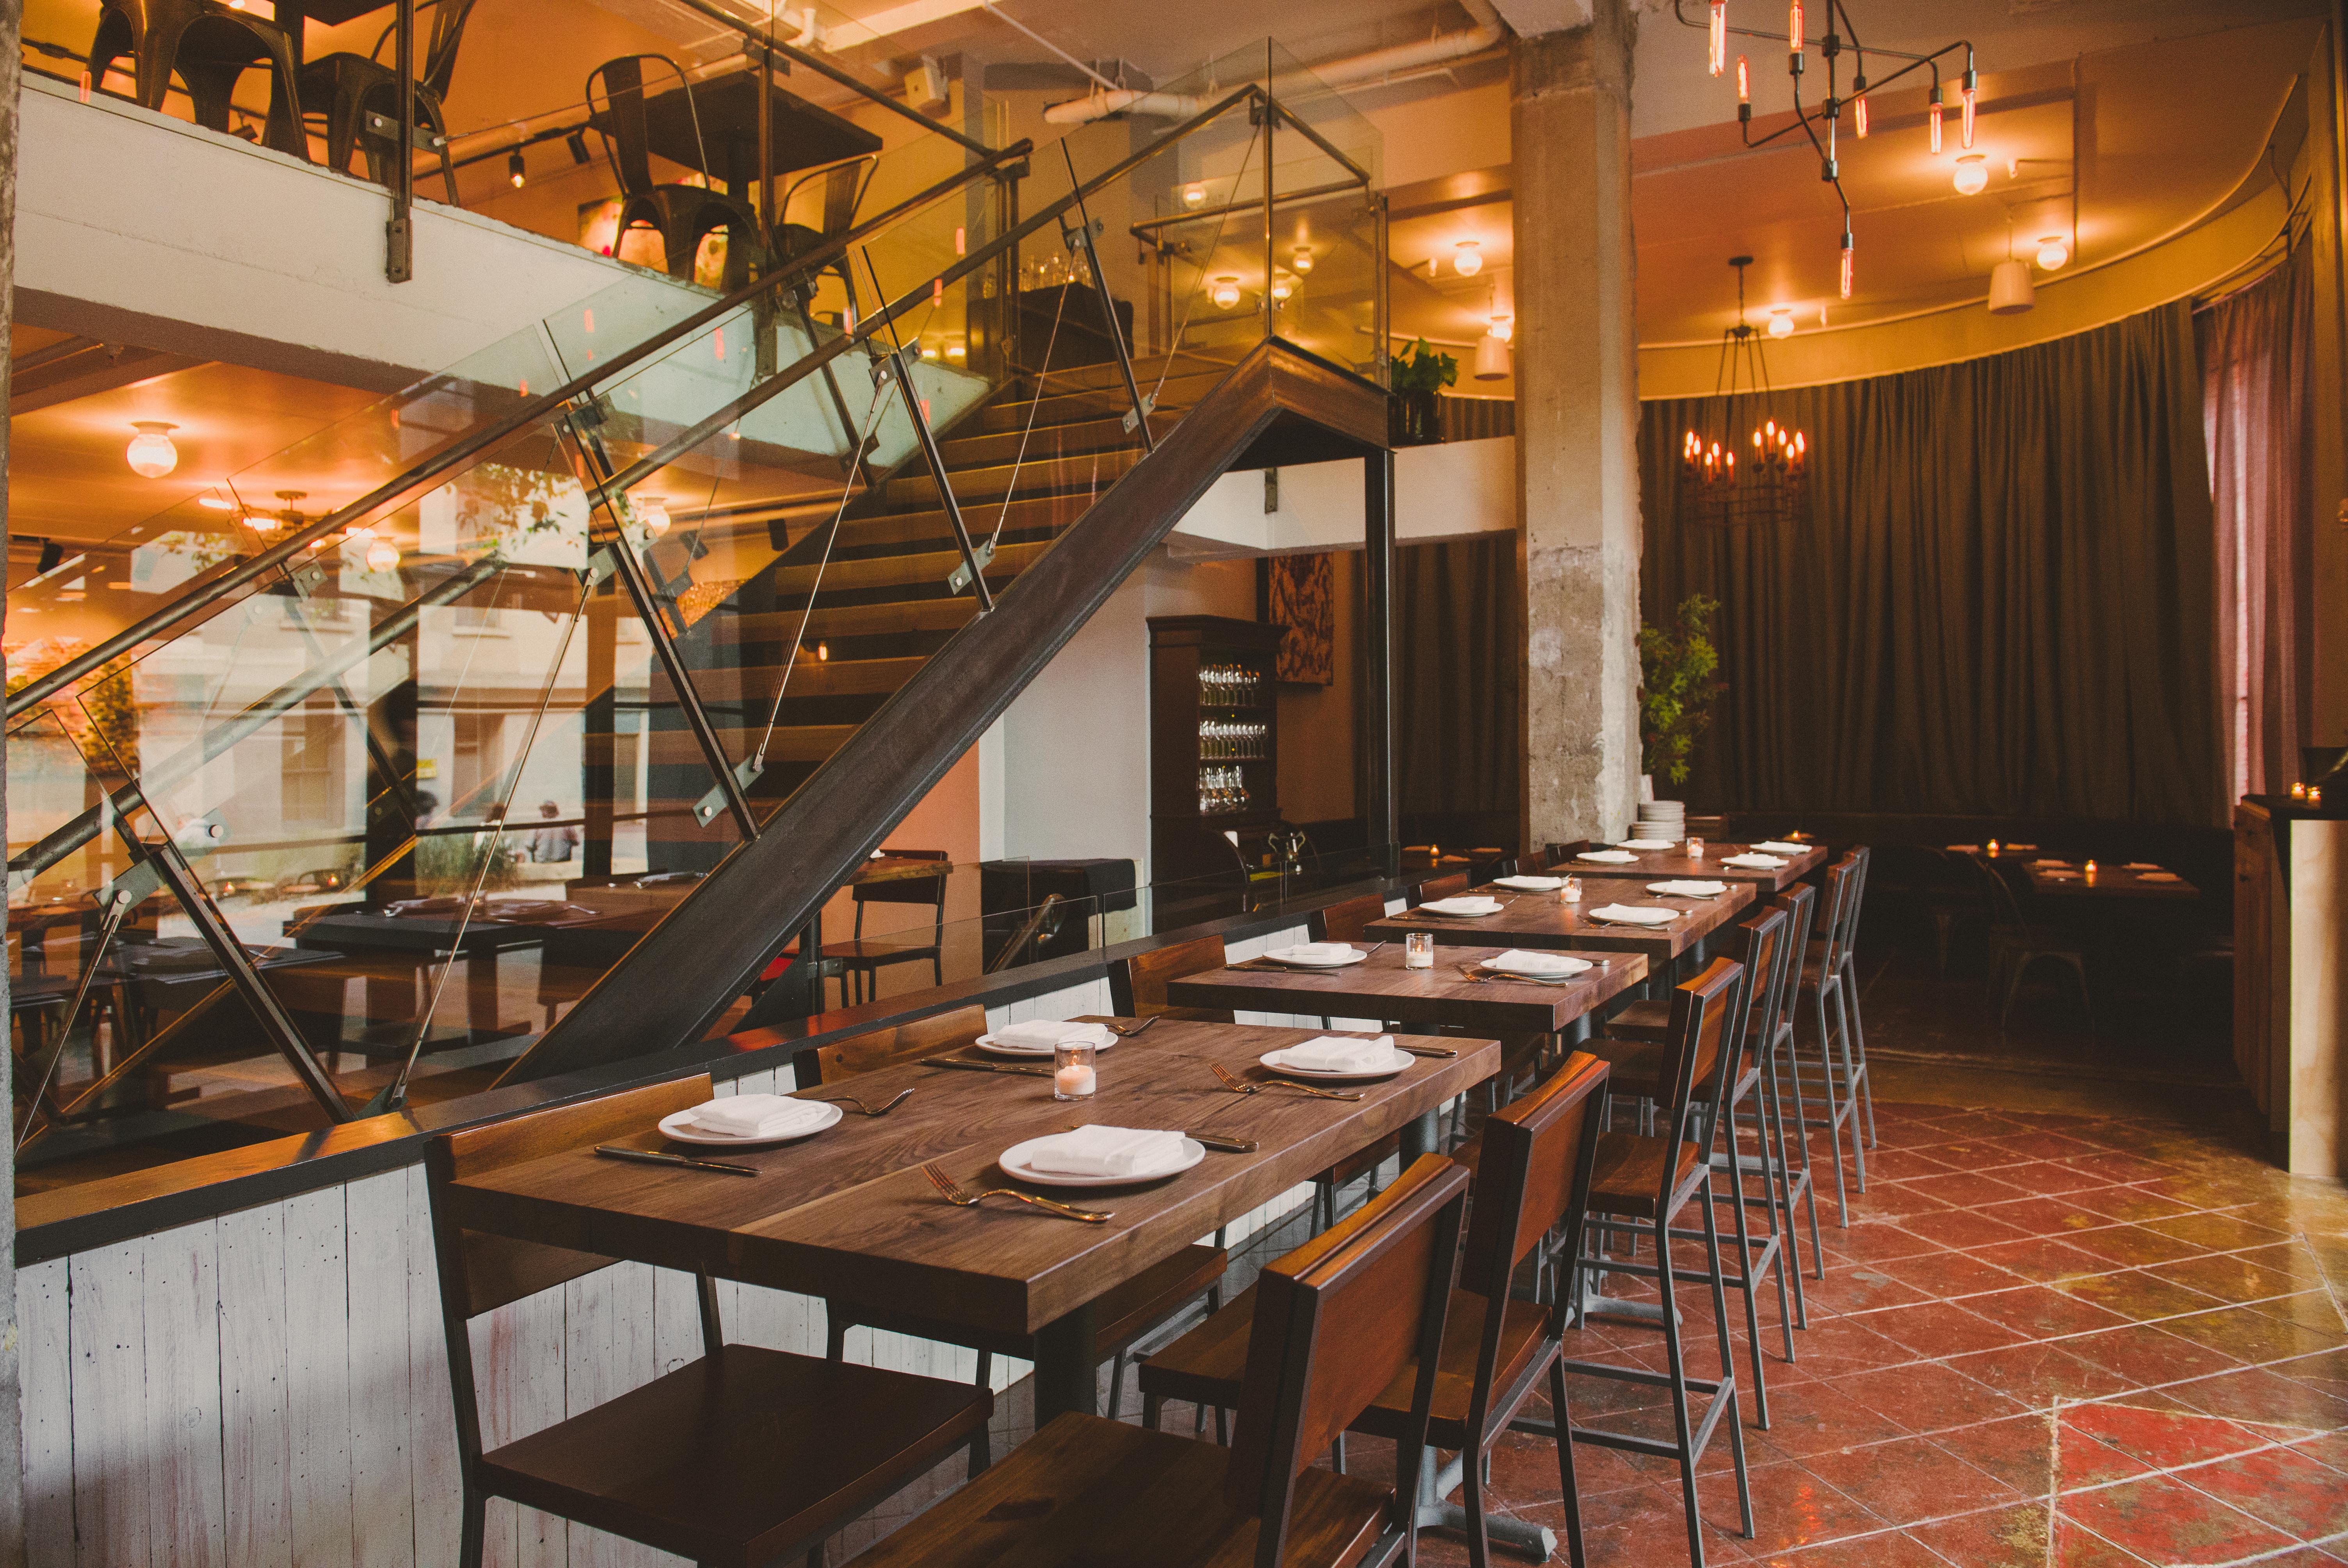 Oro, a restaurant by Jason Fox and Timothy Felkner, on Sept. 23, 2015 in San Francisco, Ca.  (Photo copyright Nader Khouri 2015)